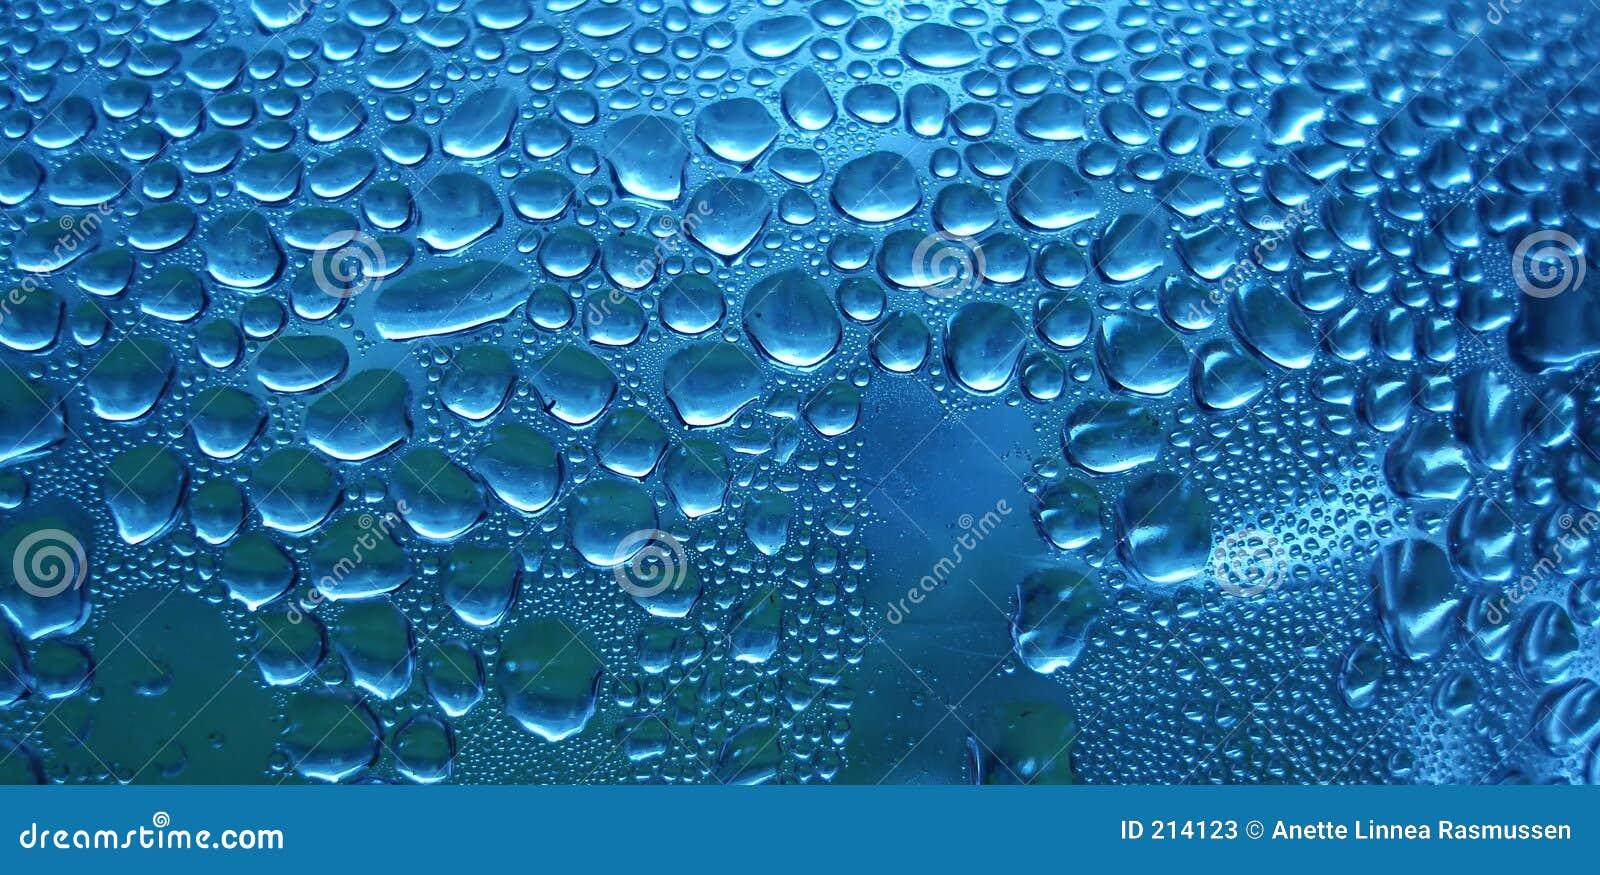 Download Gocce scintillanti blu immagine stock. Immagine di background - 214123